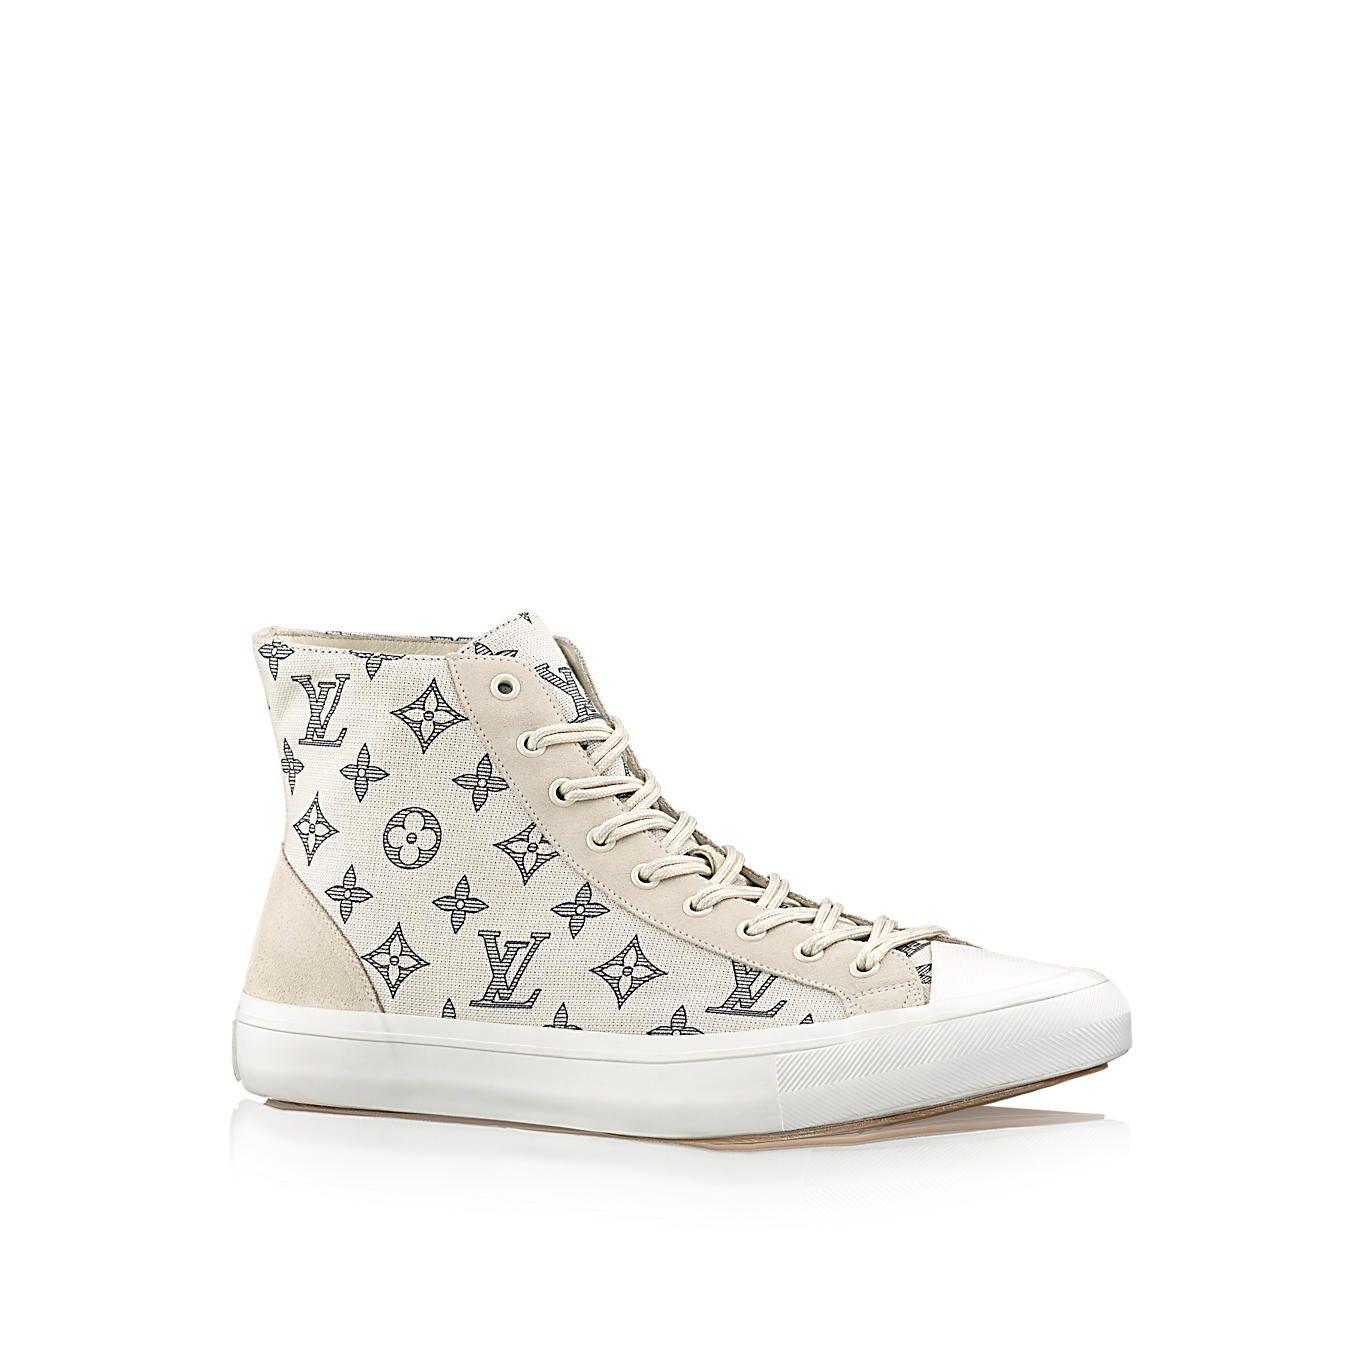 Tattoo Sneaker Boot in Men's Fashion